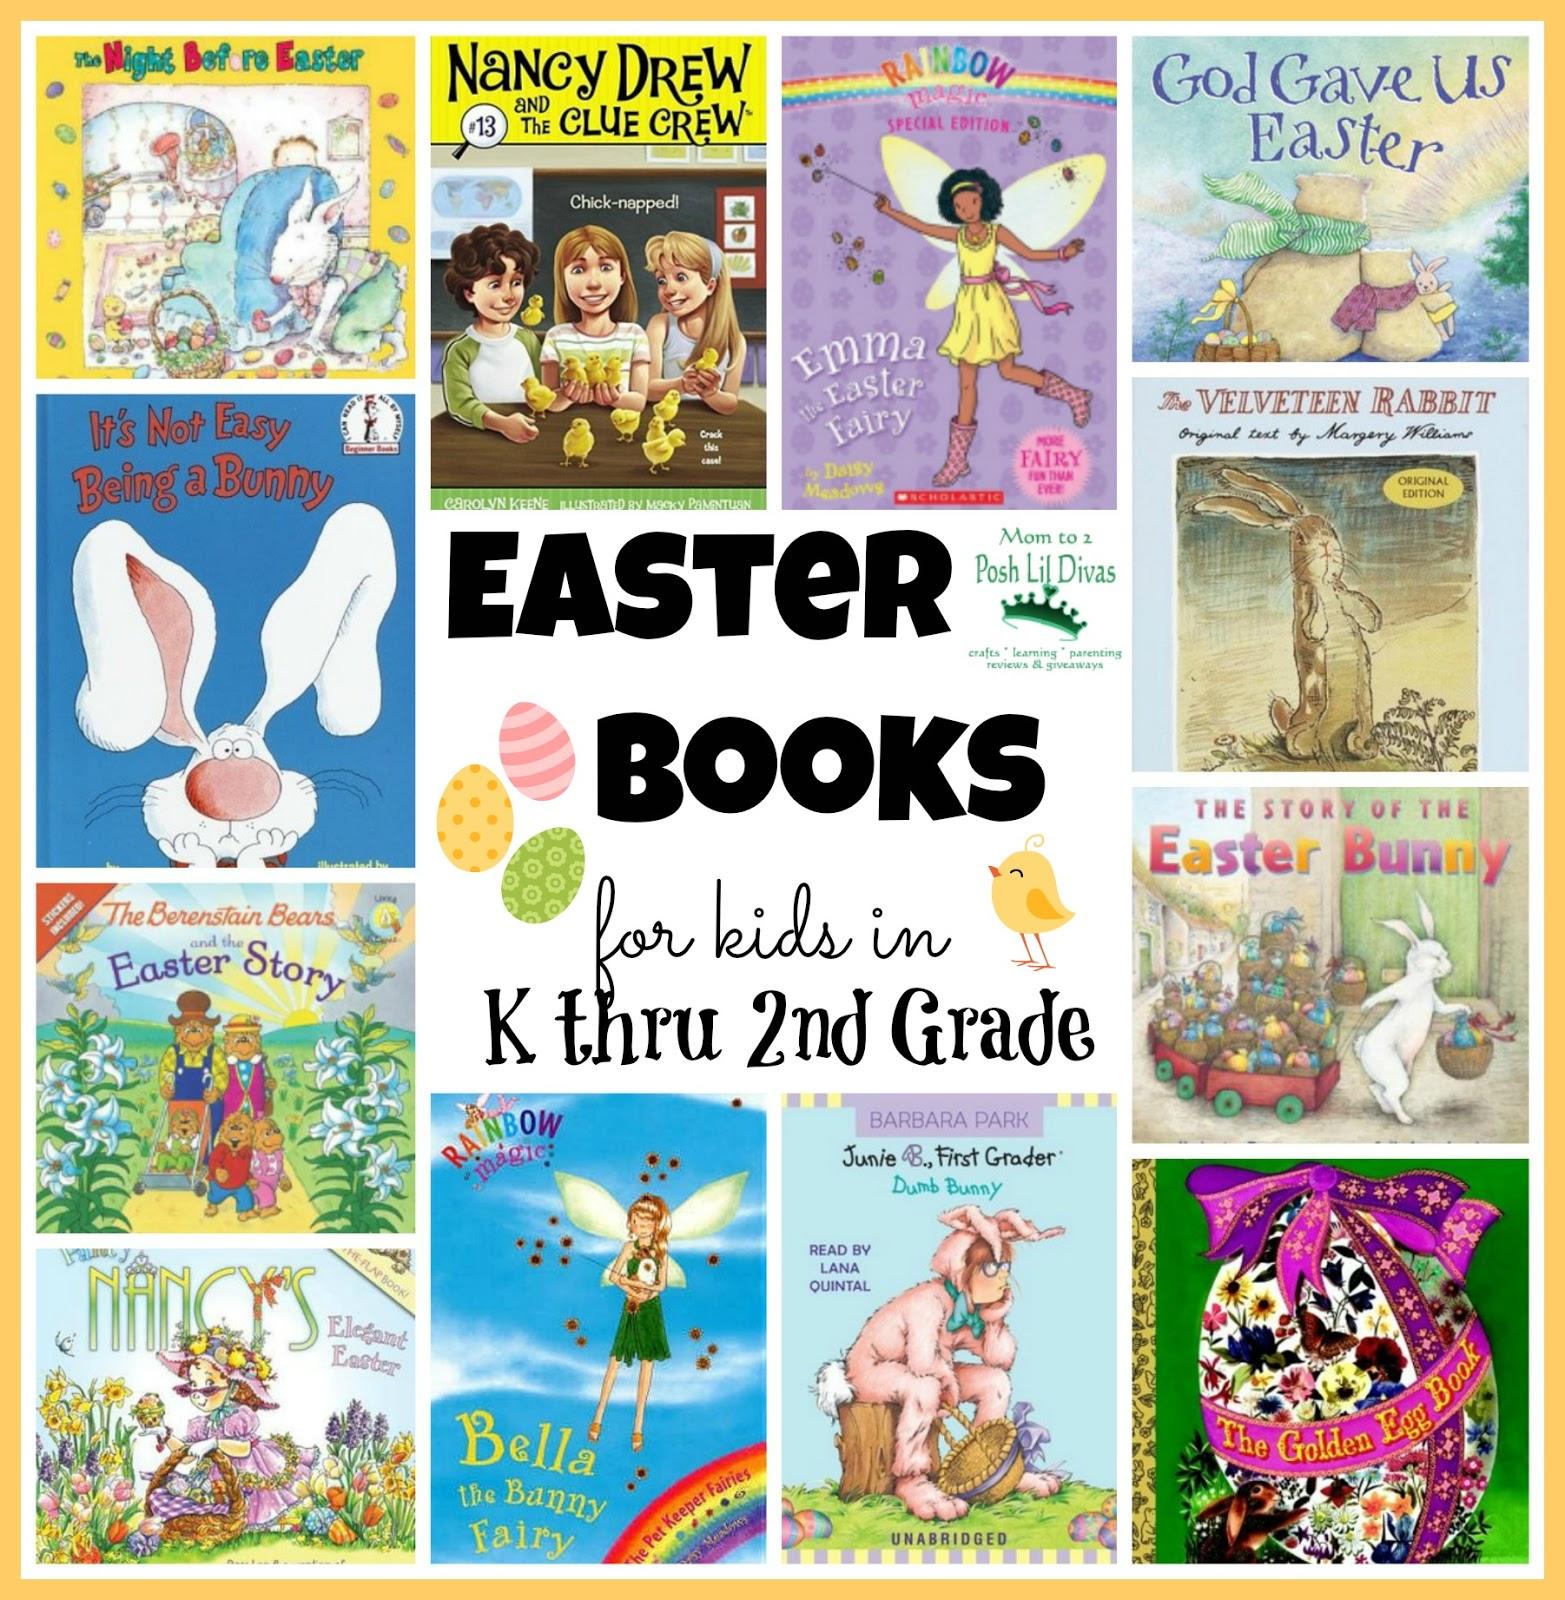 Mom To 2 Posh Lil Divas Easter Books For Kids In K Thru 2nd Grade